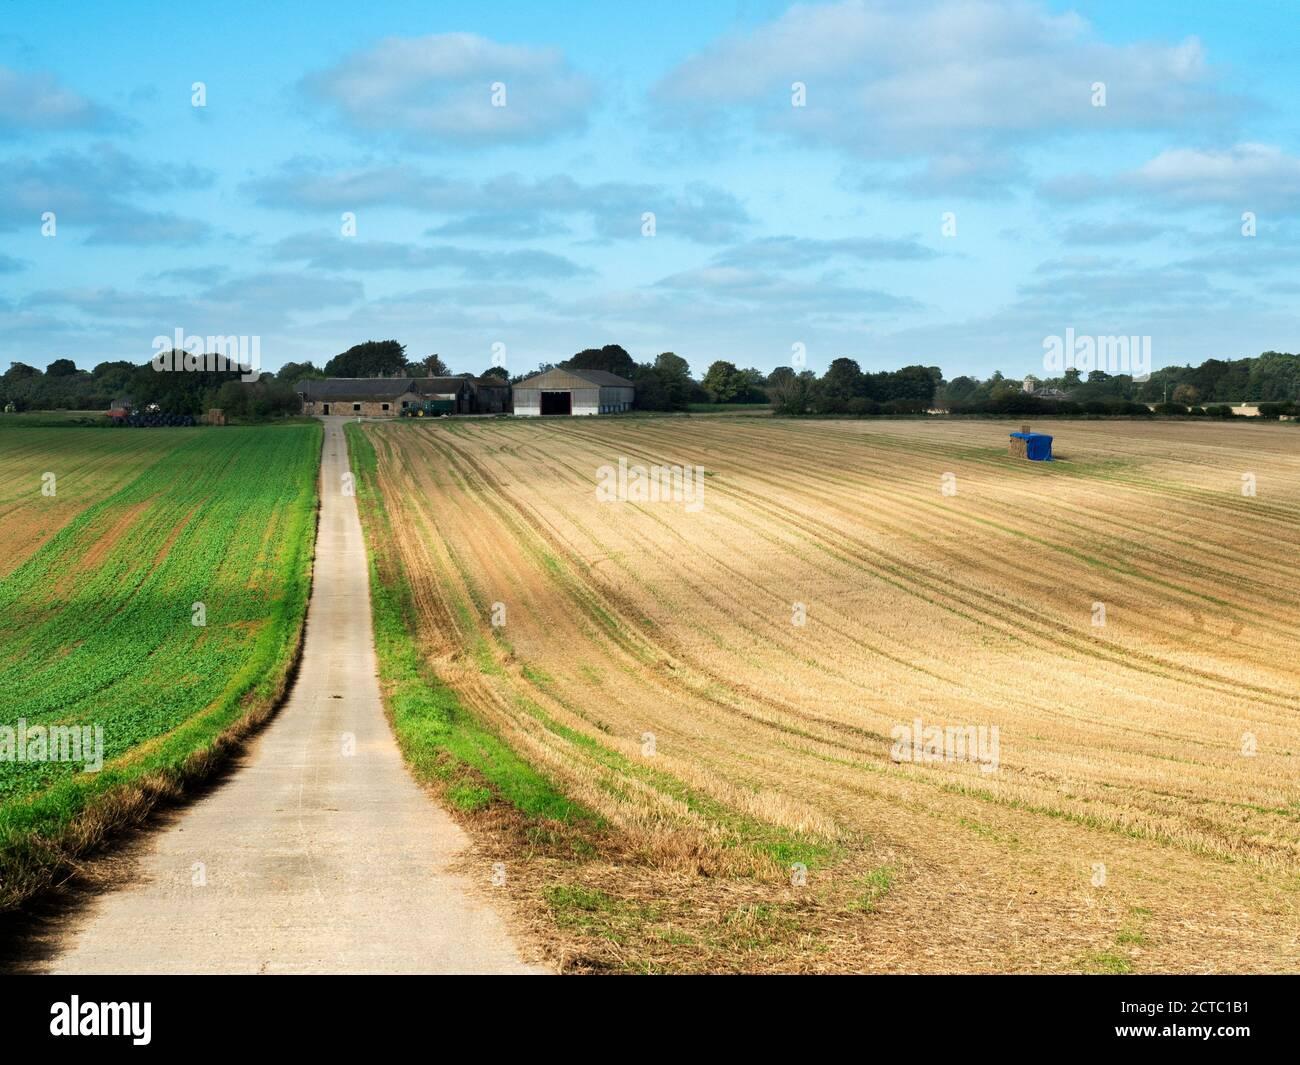 A track across sunlit farmland towards Plompton Grange with Plompton Hall in the distance near Knaresborough North Yorkshire England Stock Photo